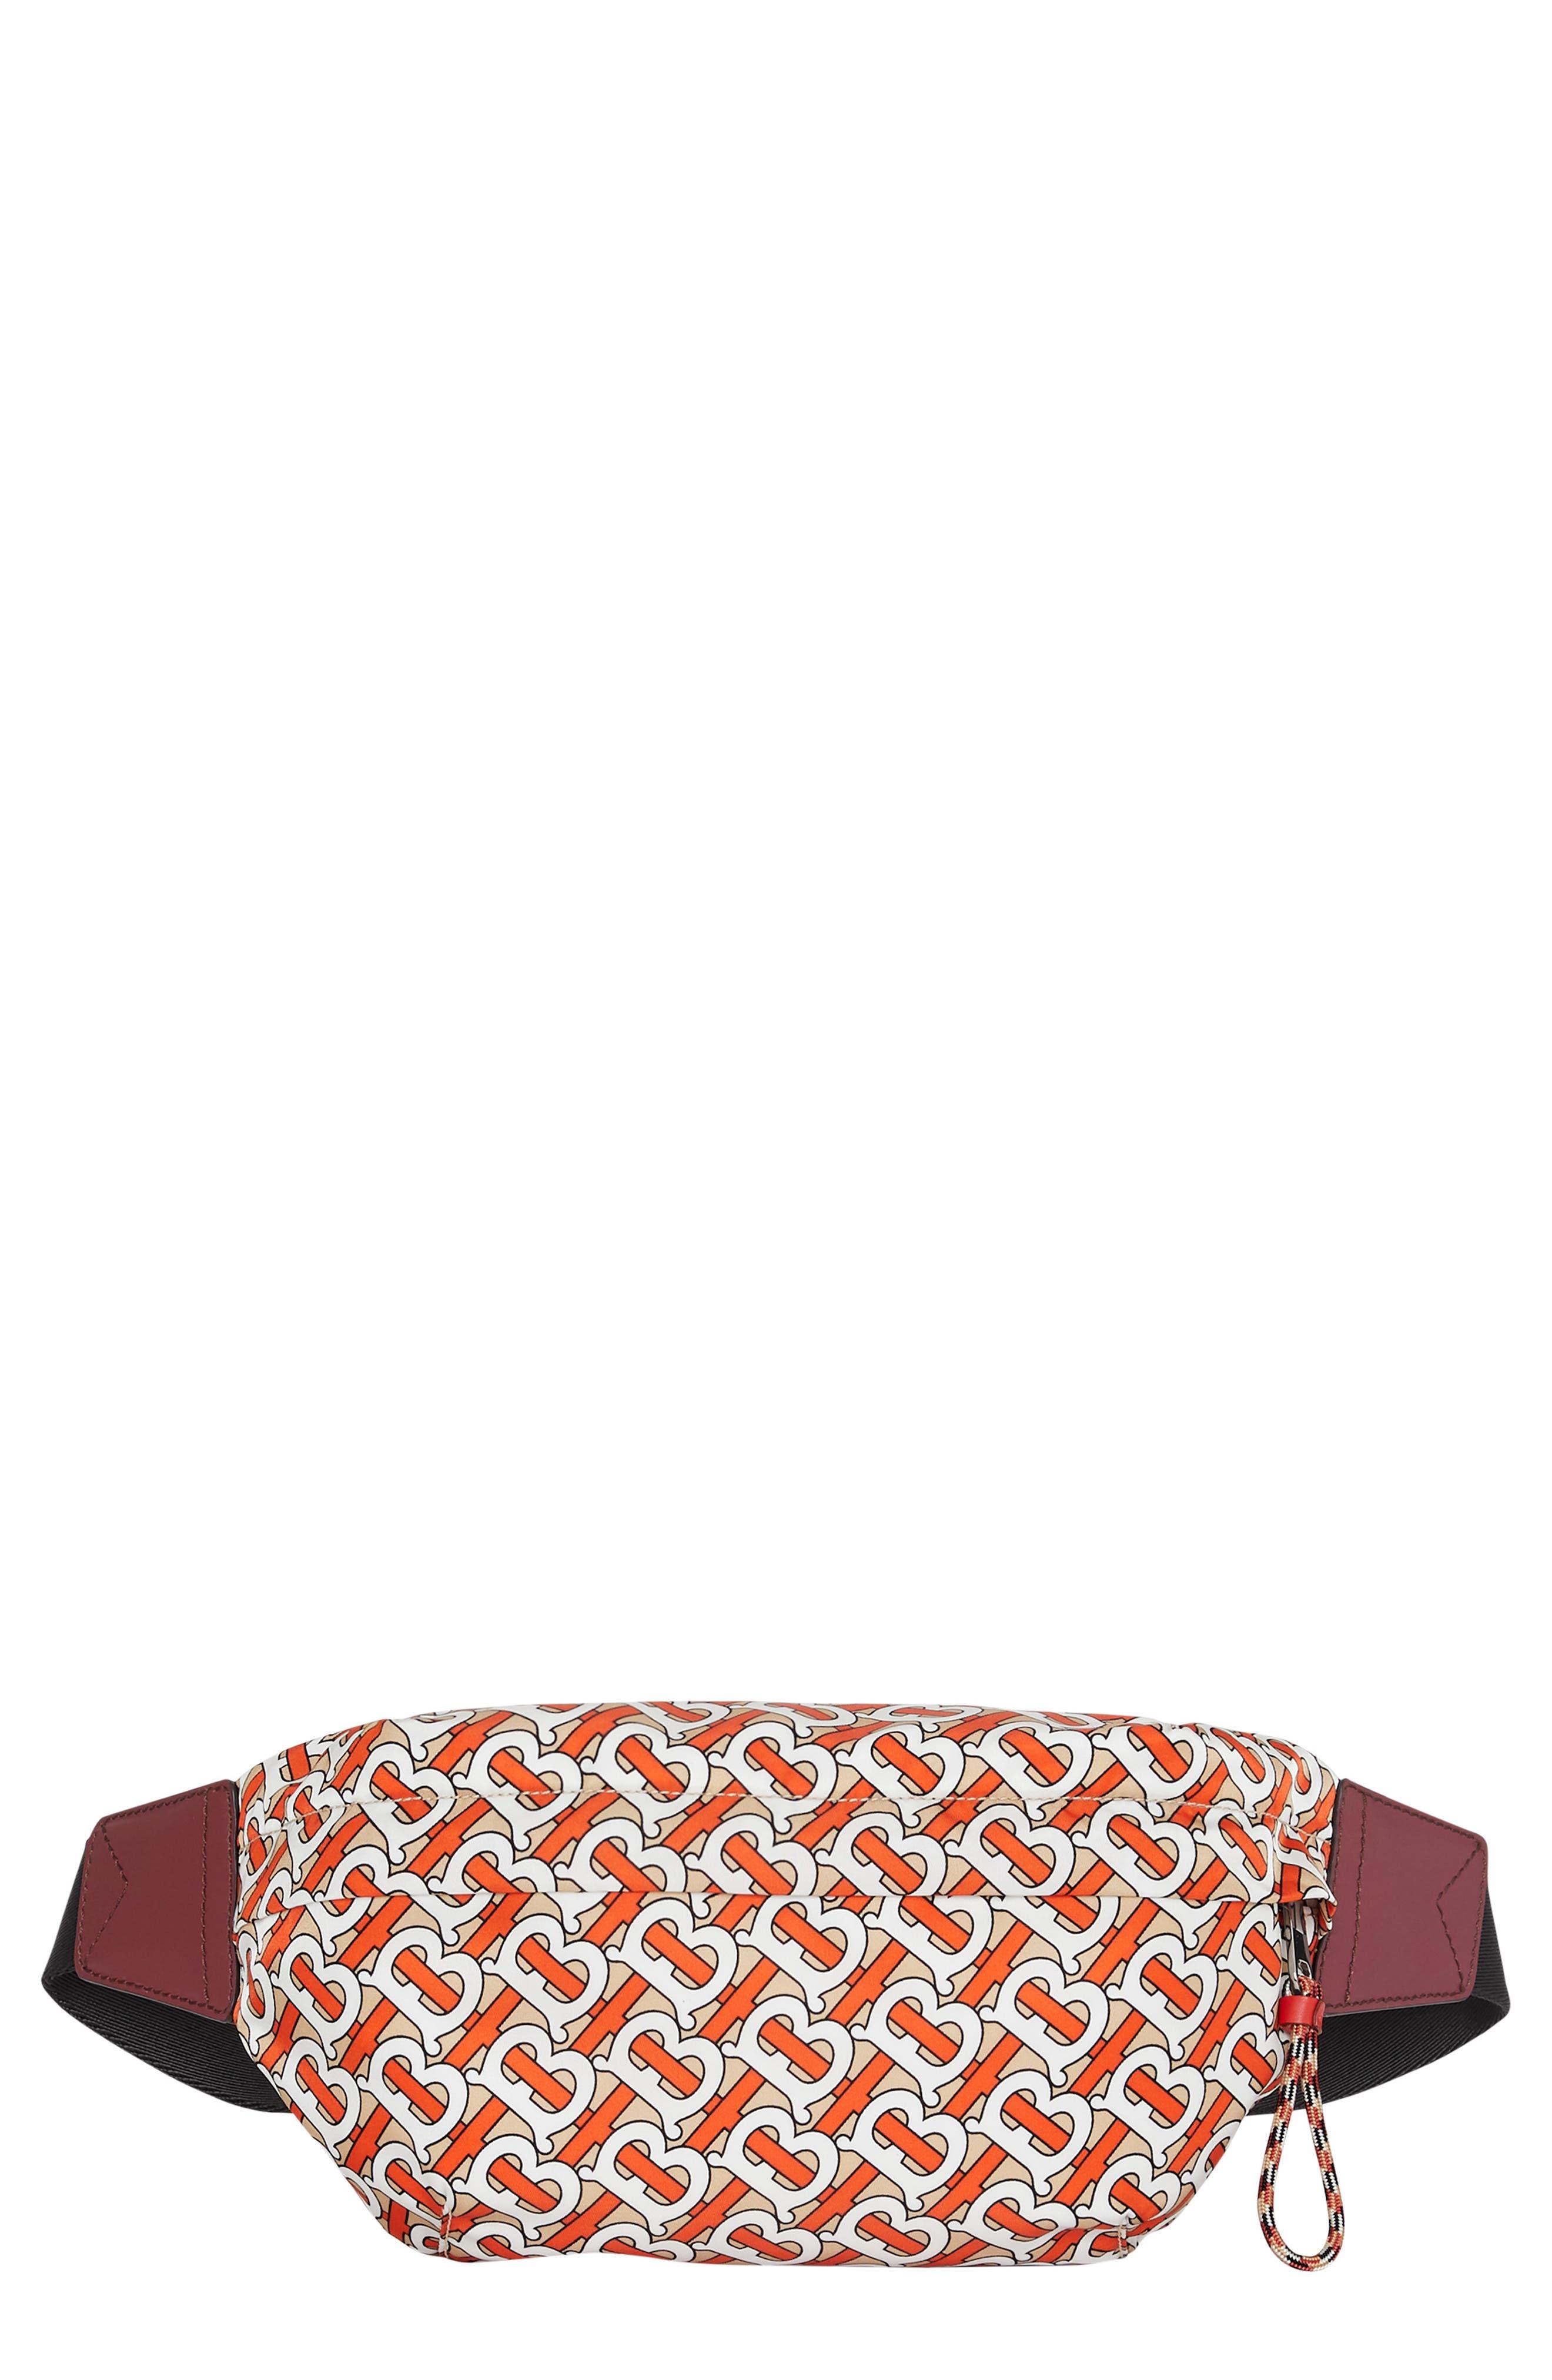 BURBERRY Sonny Monogram Nylon Belt Bag, Main, color, VERMILLION